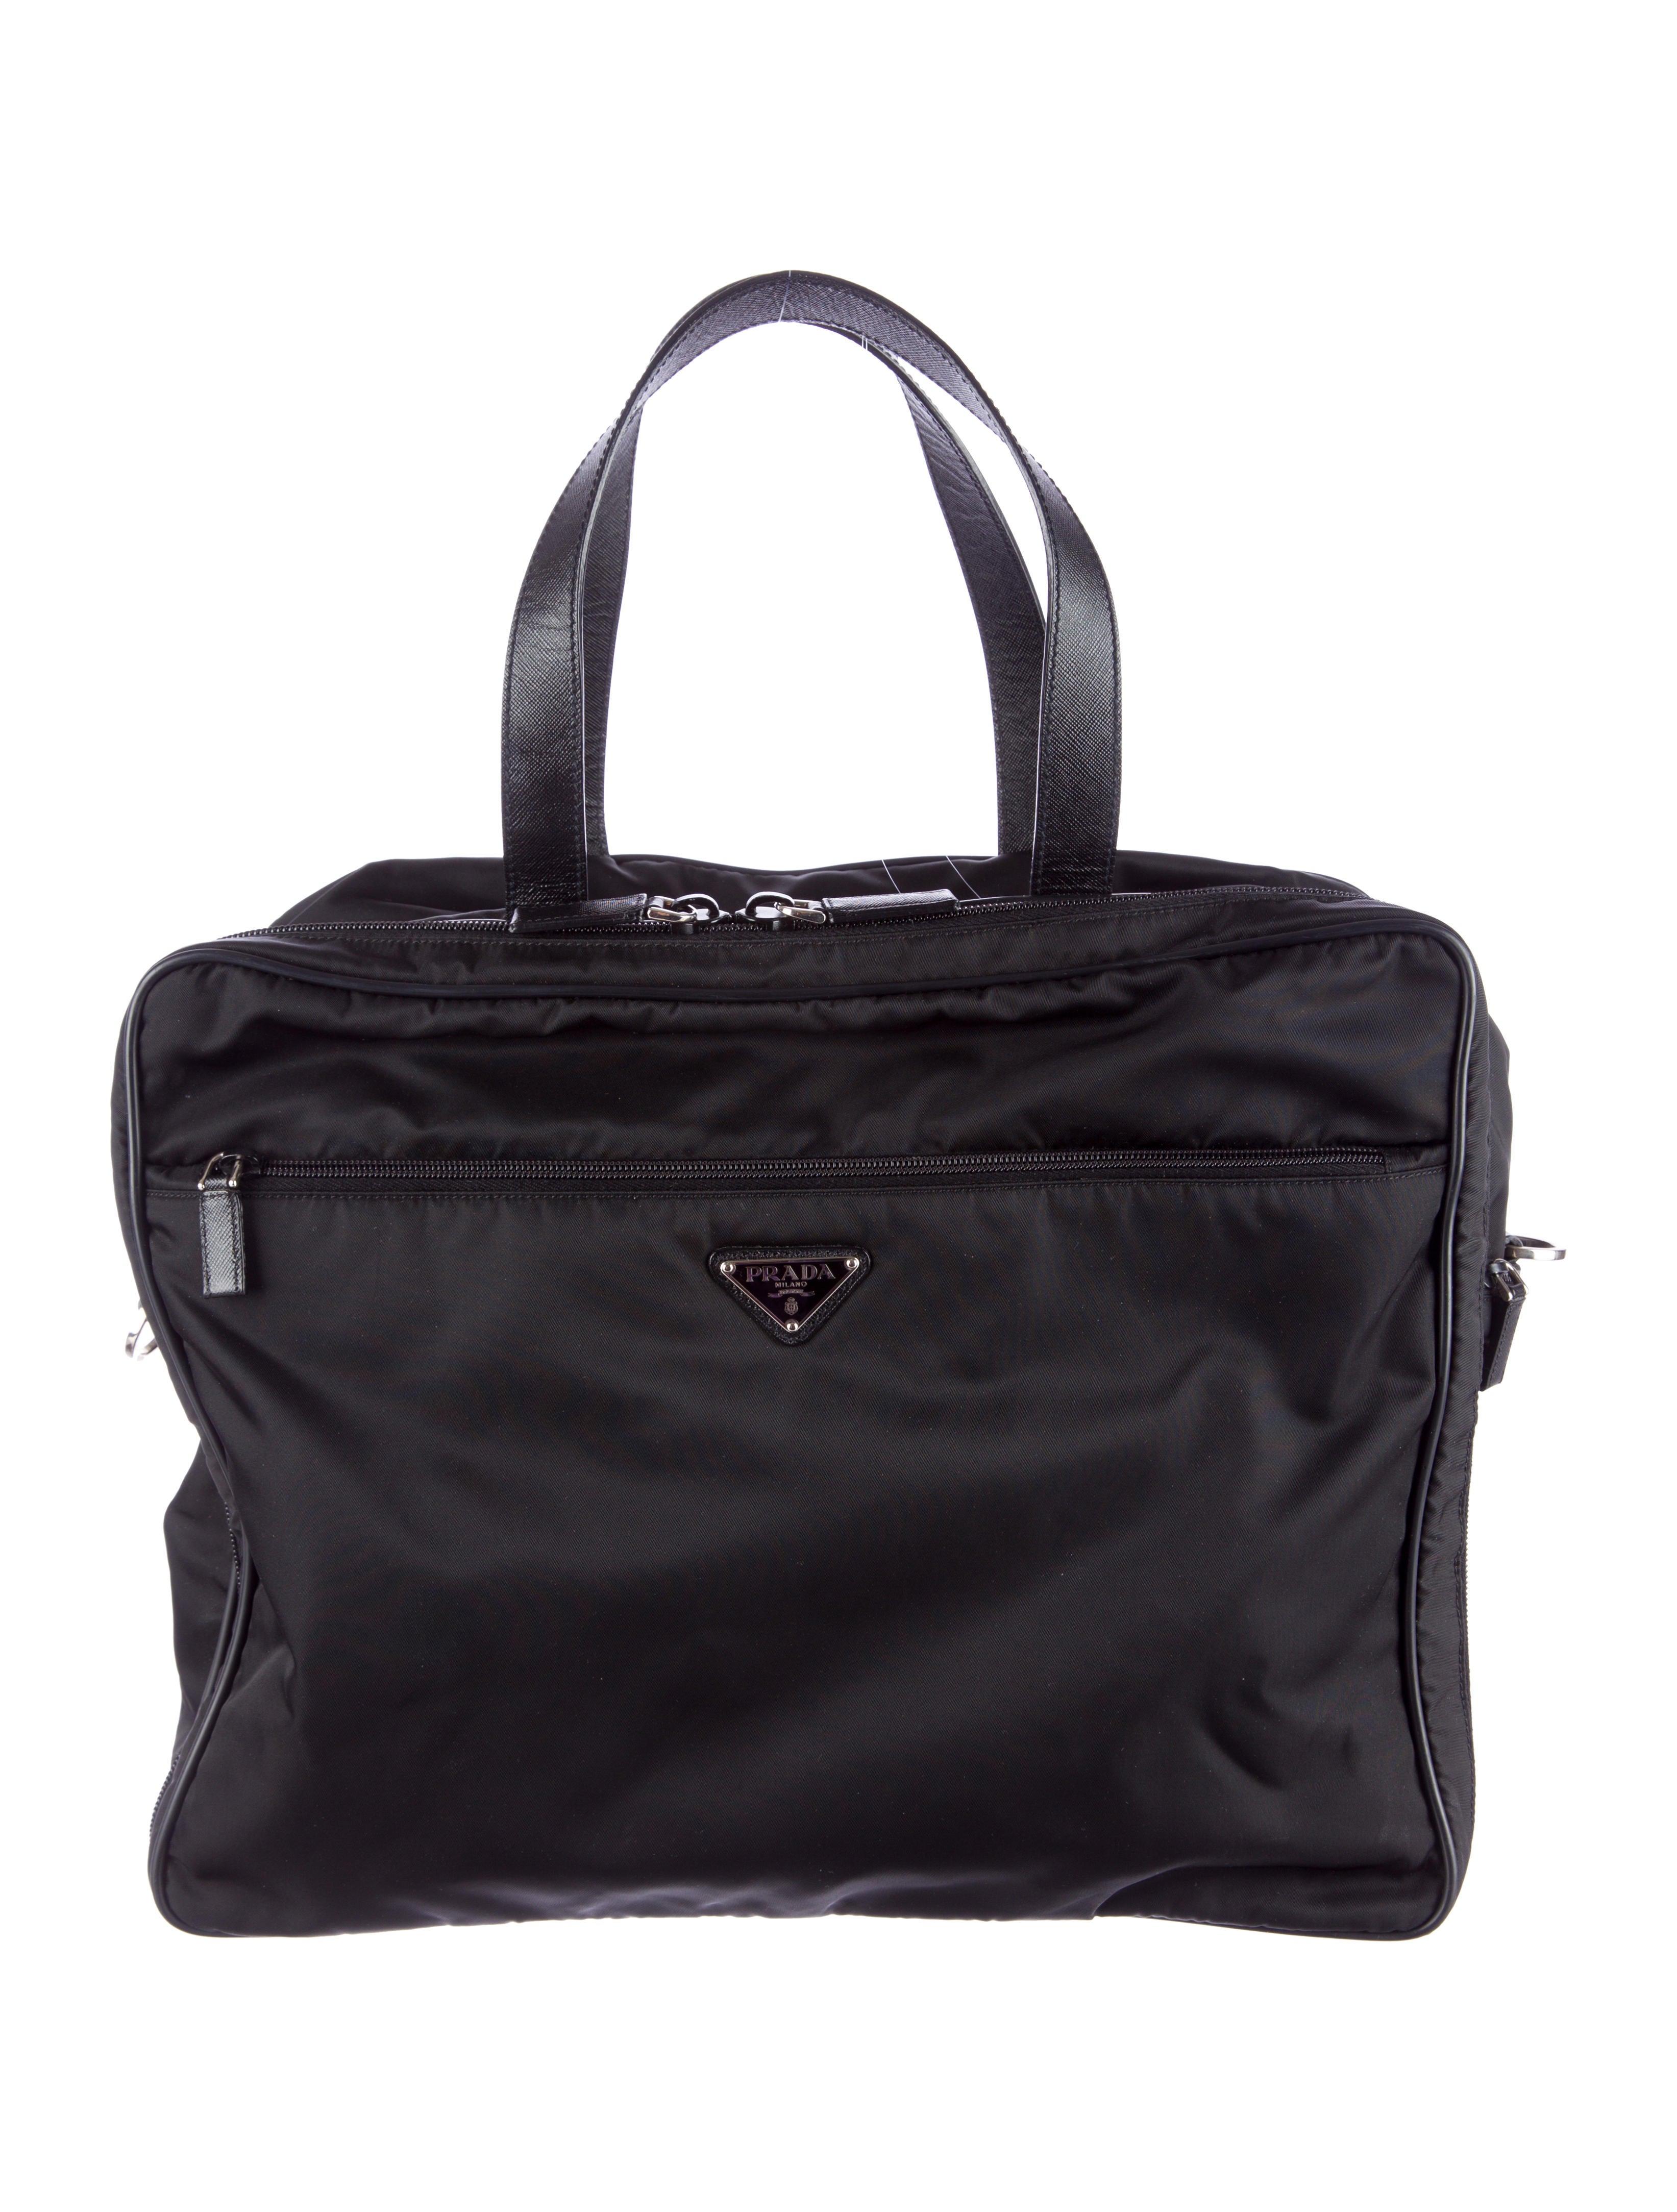 Creative Prada Computer Bag Women Prada Handbags Discount